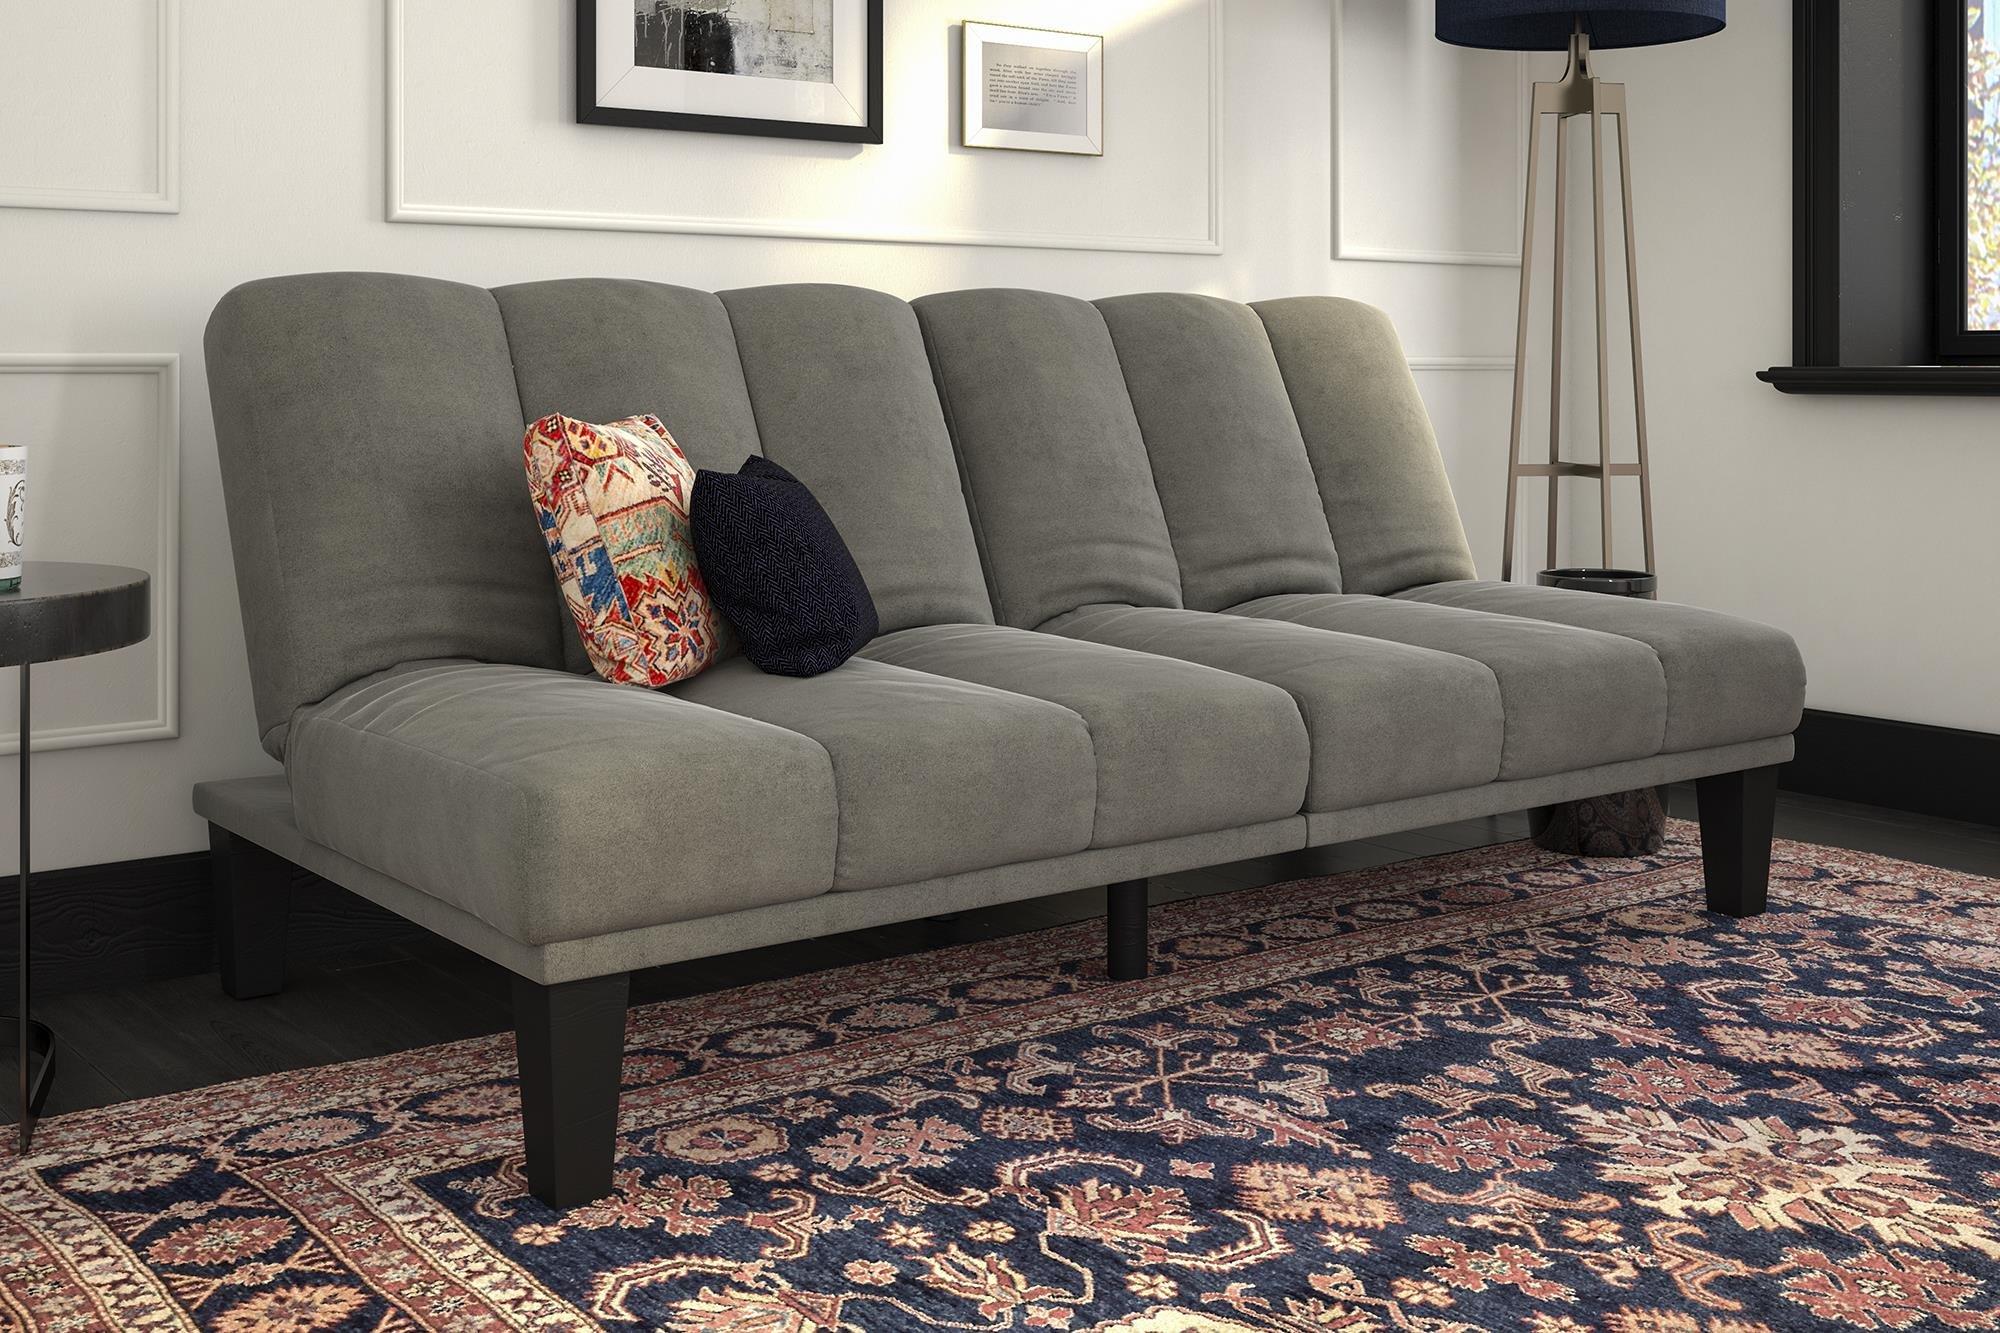 DHP Hamilton Estate Premium Futon Sofa Sleeper, Comfortable Plush Microfiber Upholstery, Rich Grey by DHP